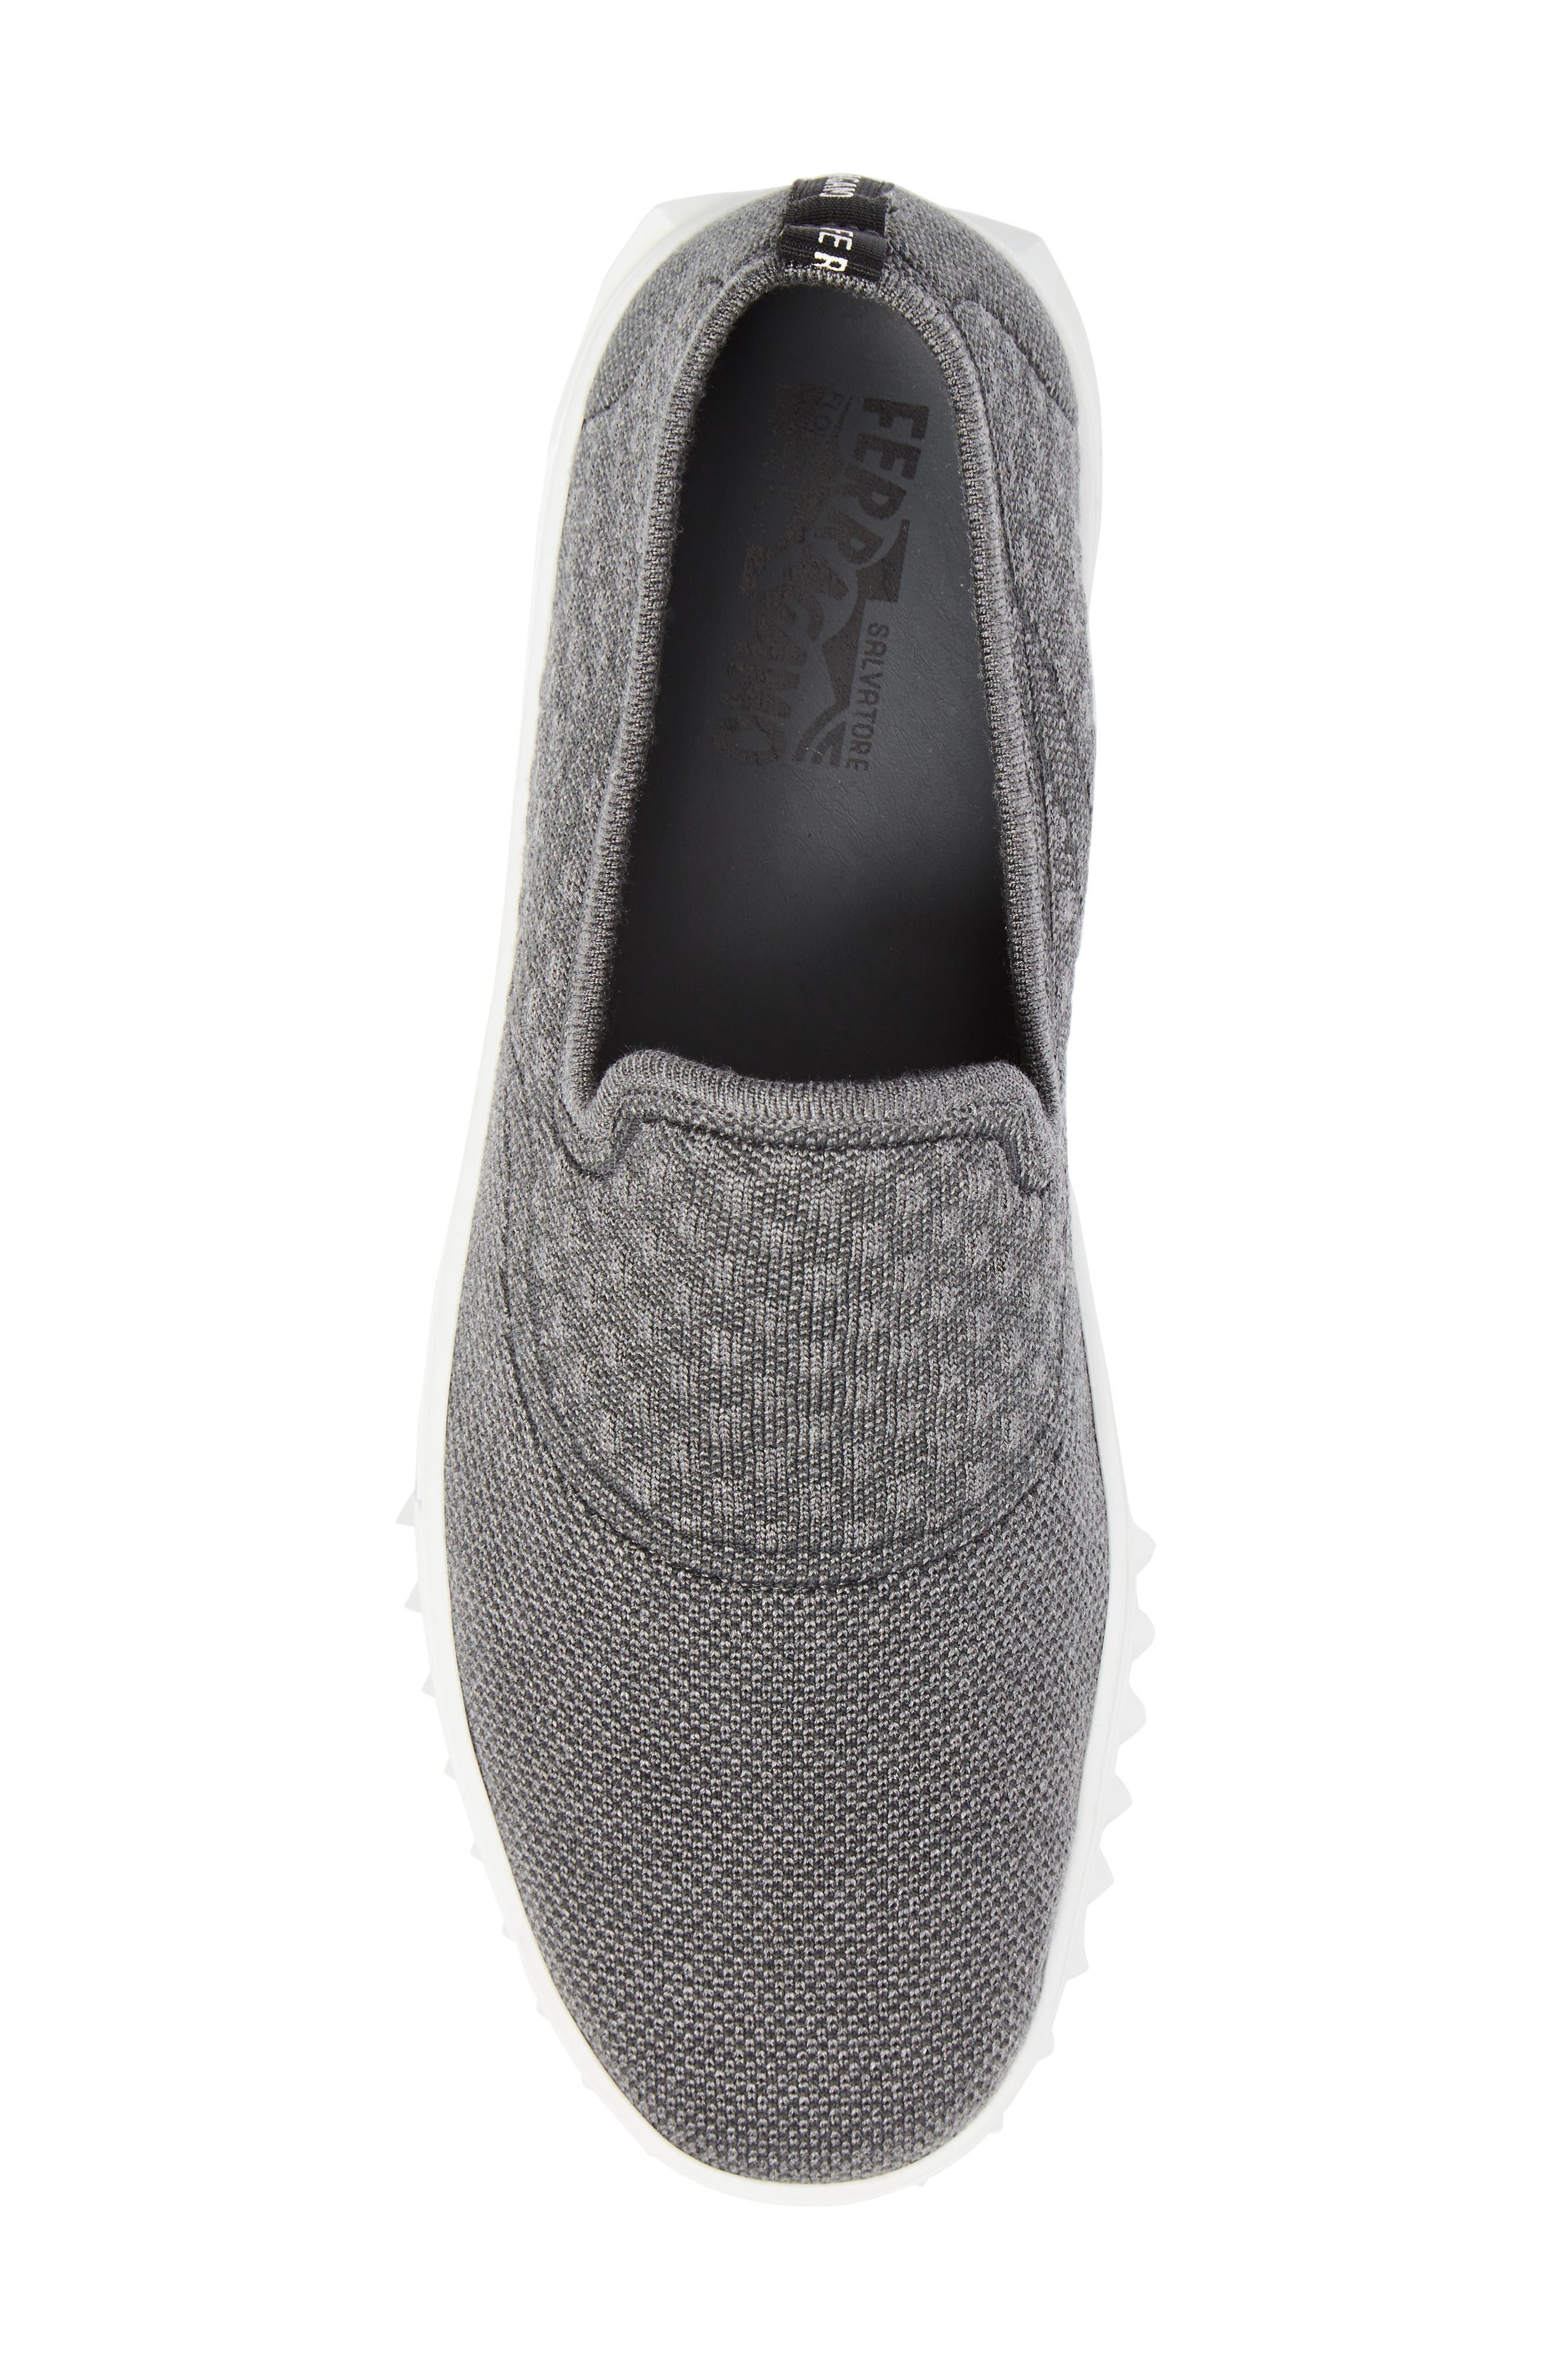 Clay Slip-On Sneaker,                             Alternate thumbnail 5, color,                             022